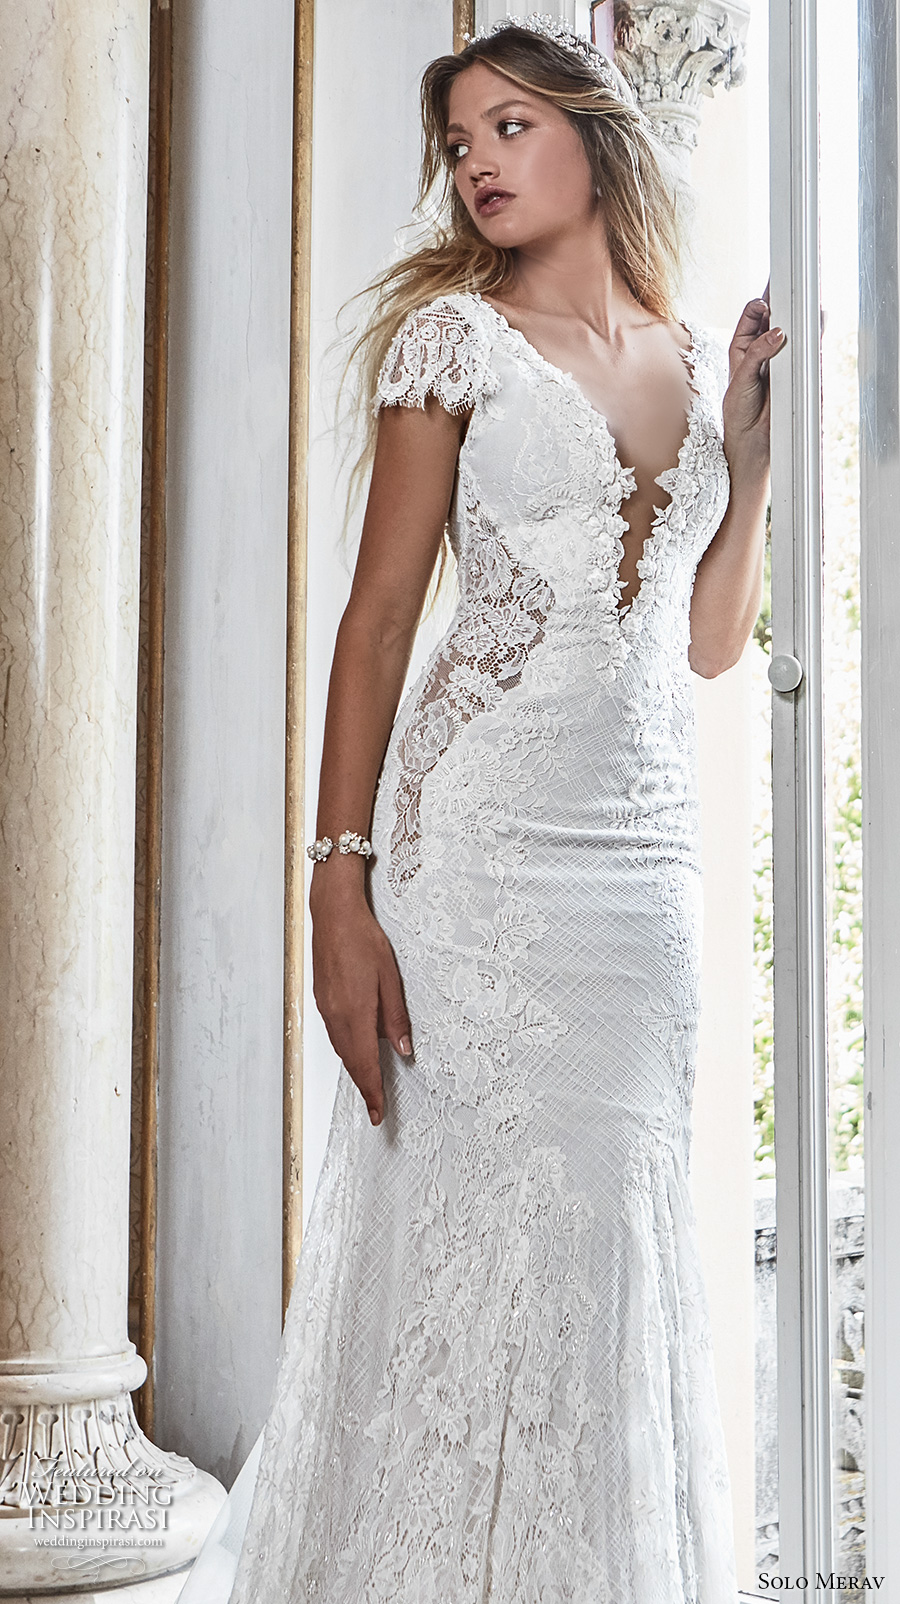 solo merav 2017 bridal cap sleeves deep plunging v neck full embellishment elegant romantic trumpet wedding dress low back chapel train (lizet) zv